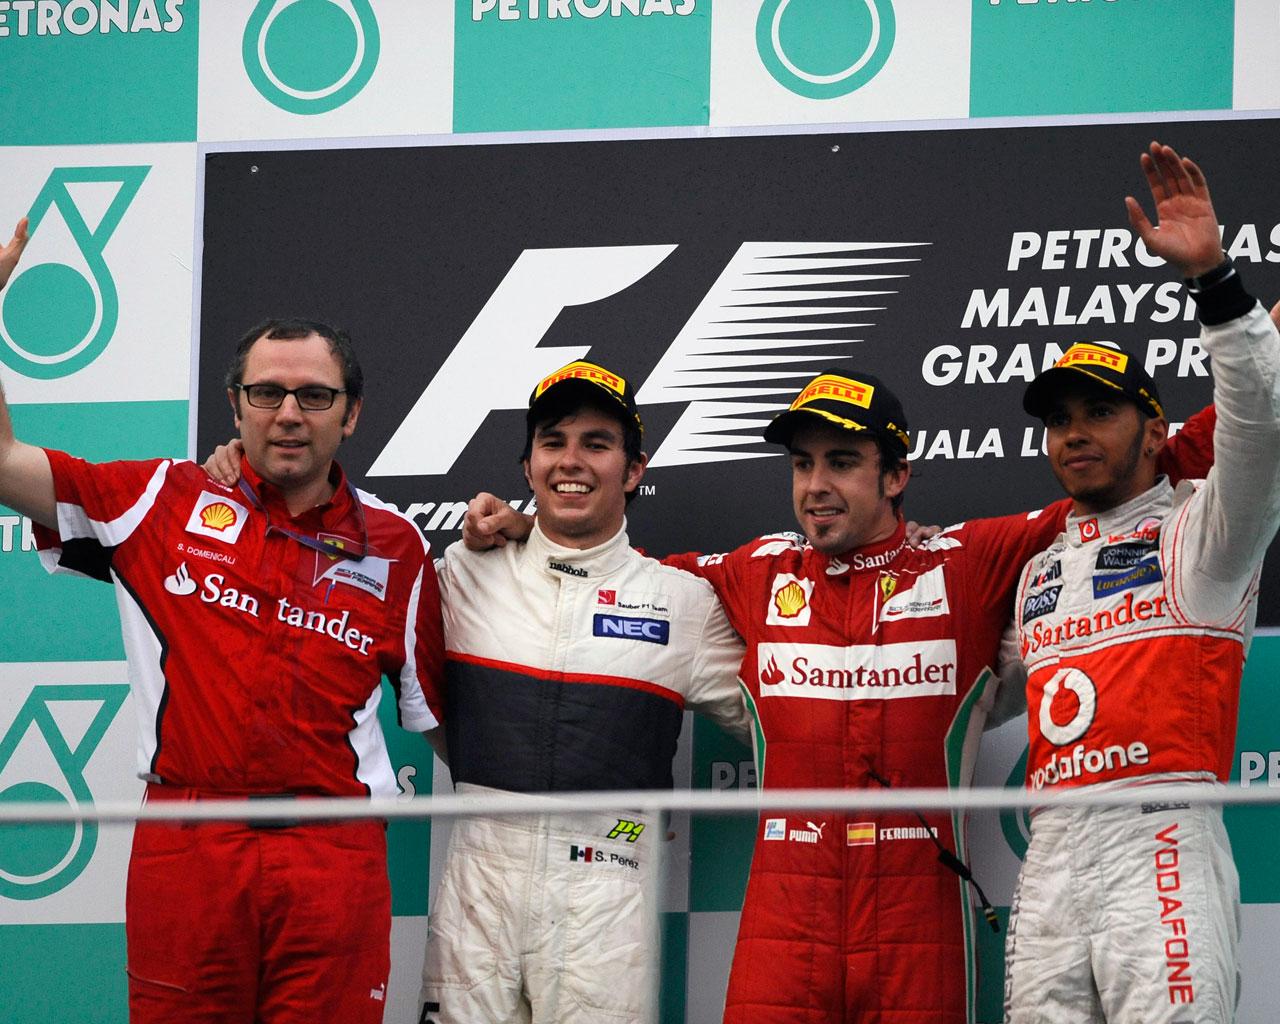 2012-Malaysian-GP-Podium-sergio-perez-30